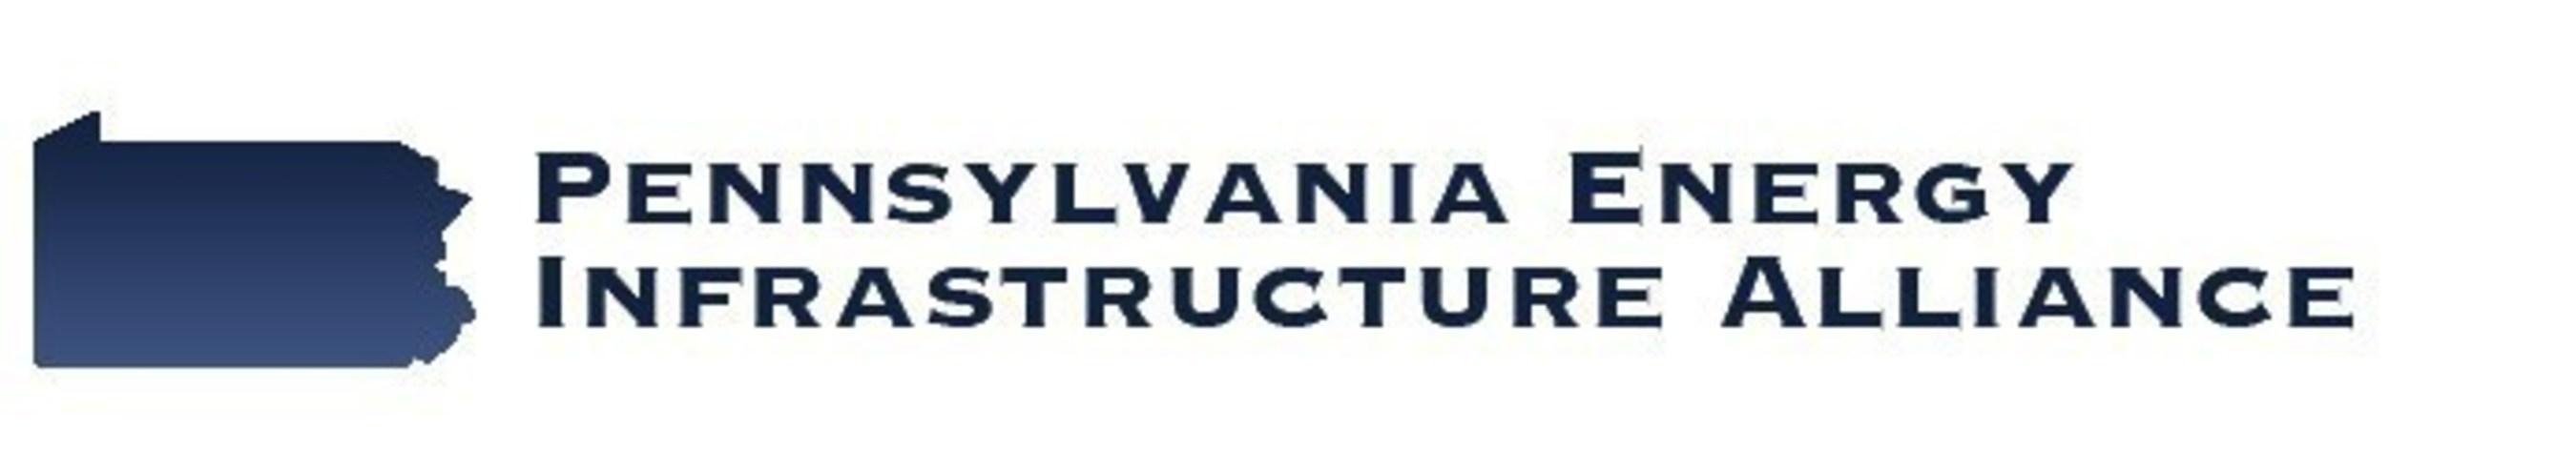 Pennsylvania Energy Infrastructure Alliance.